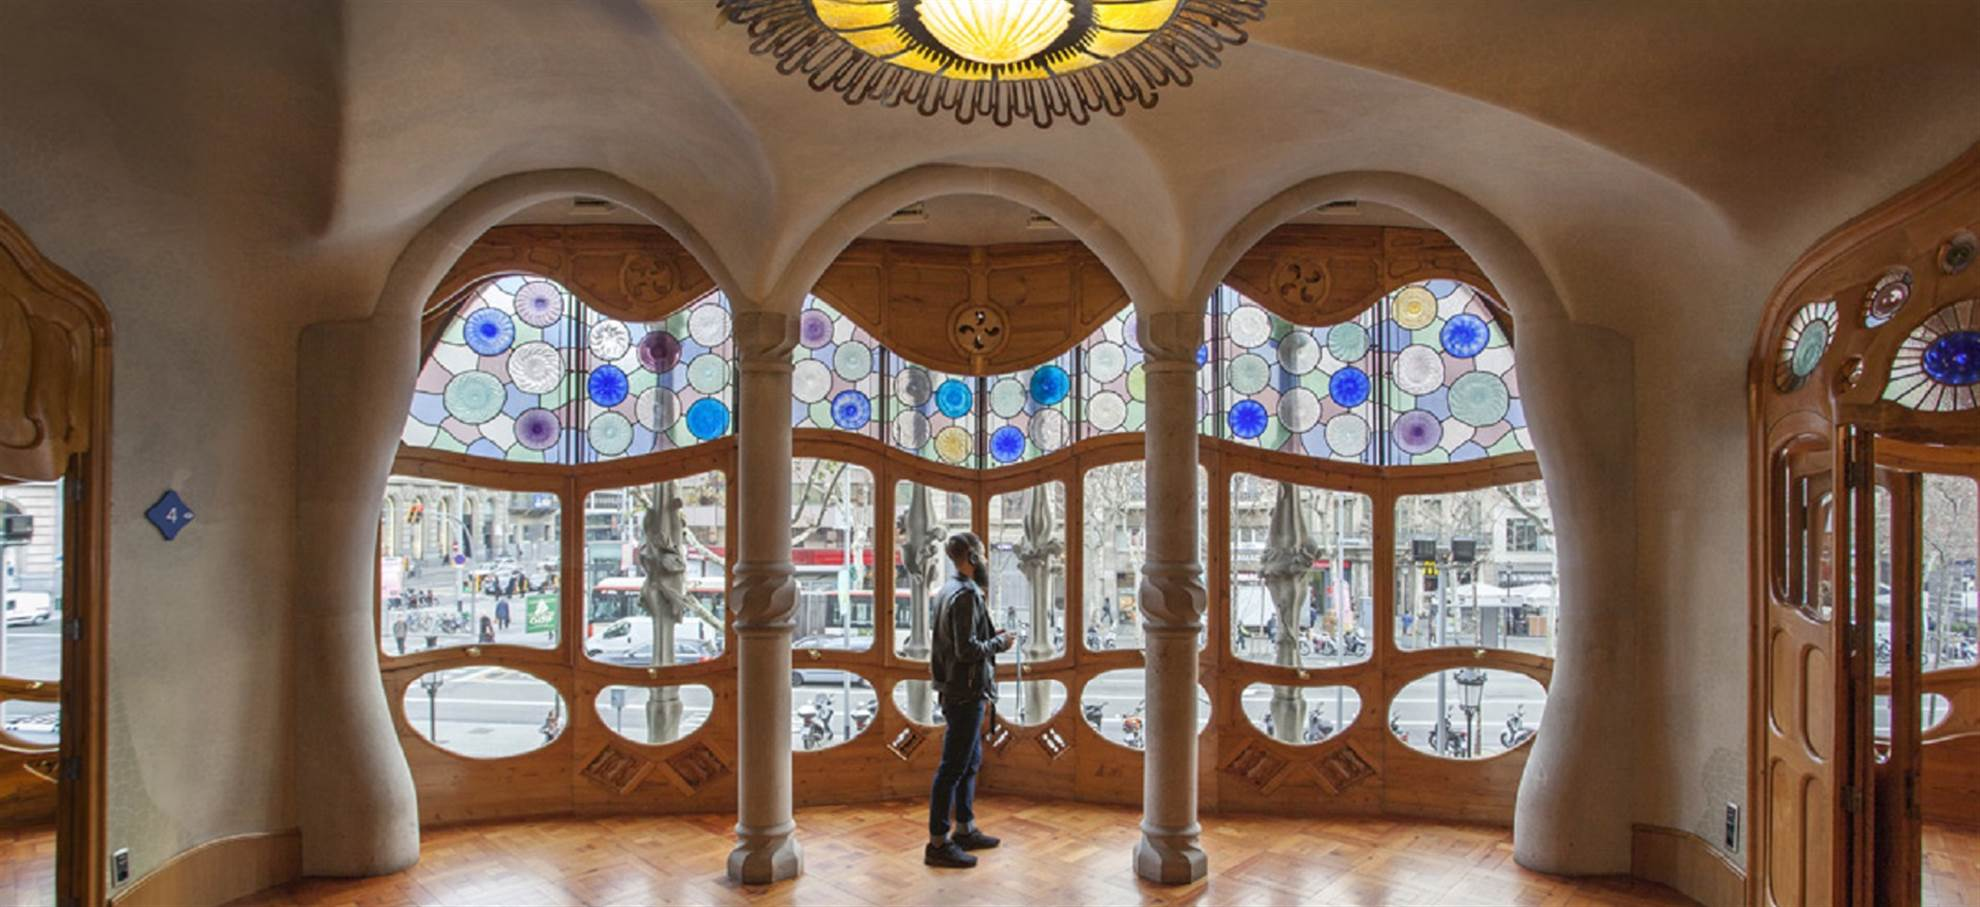 Casa Batlló - Sii il primo!